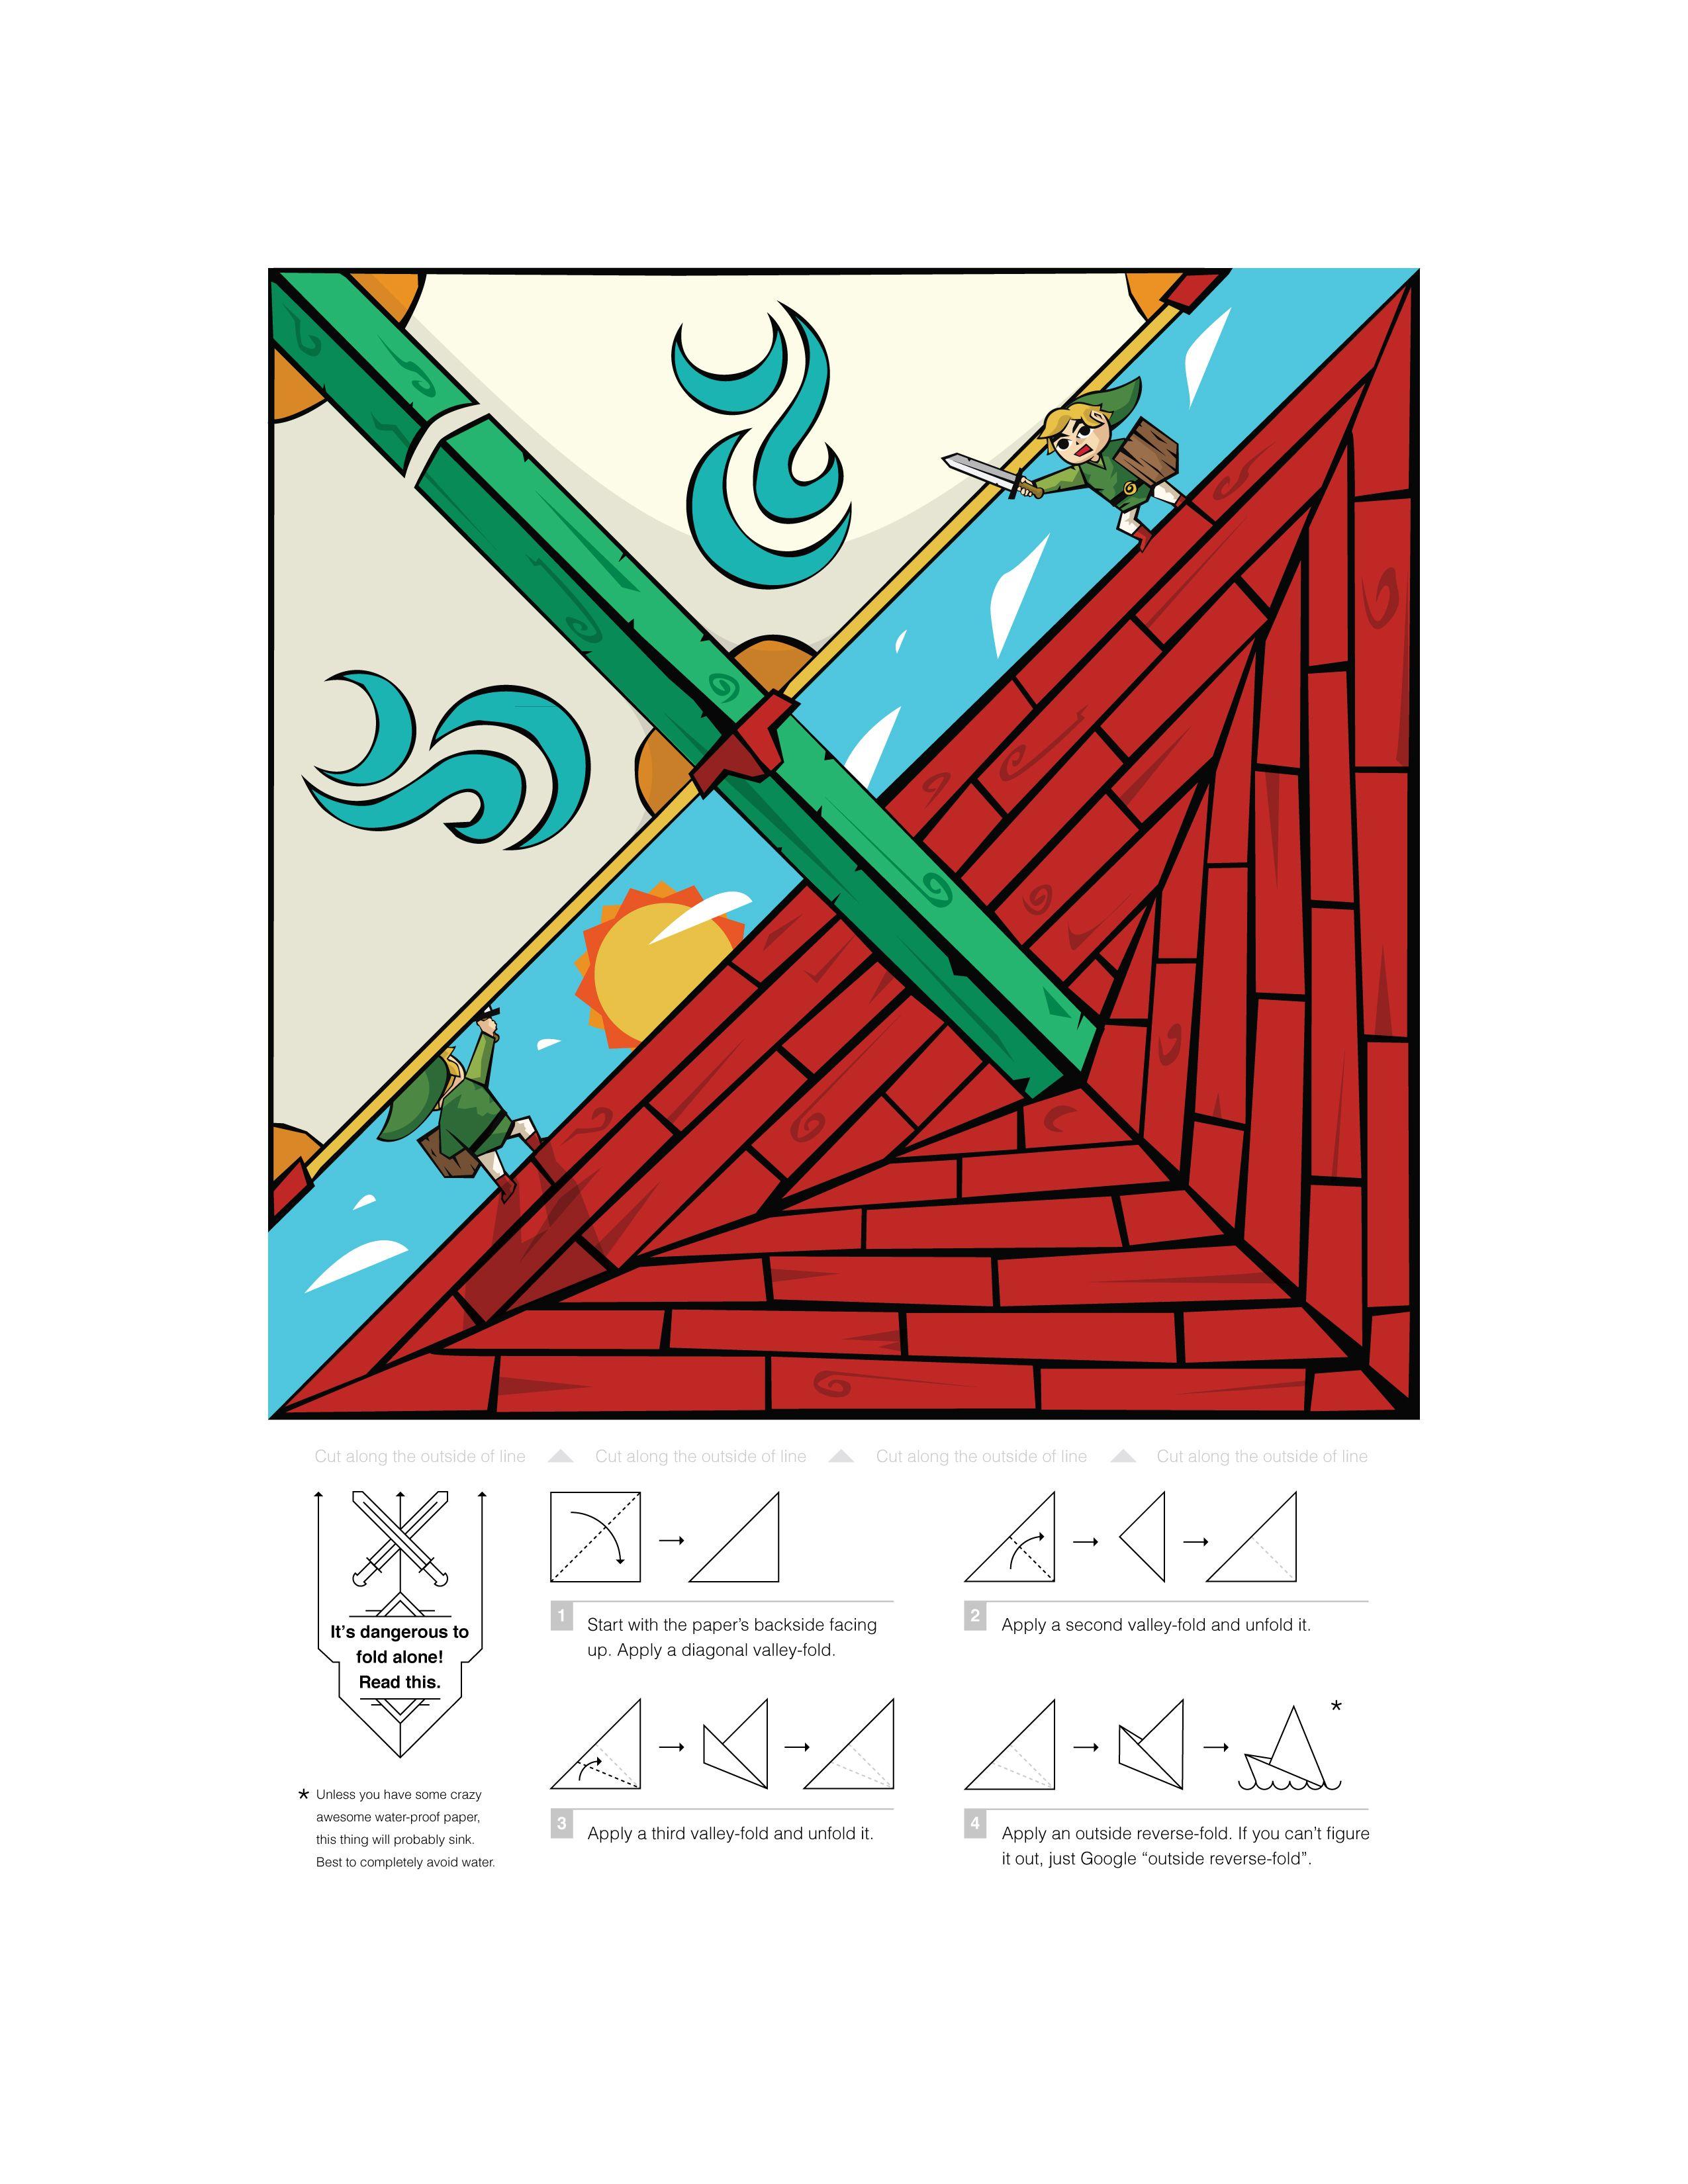 Geek 014 The Legend Of Zelda Red Lion King Origami Boat Front Origami Boat Geeky Craft Origami